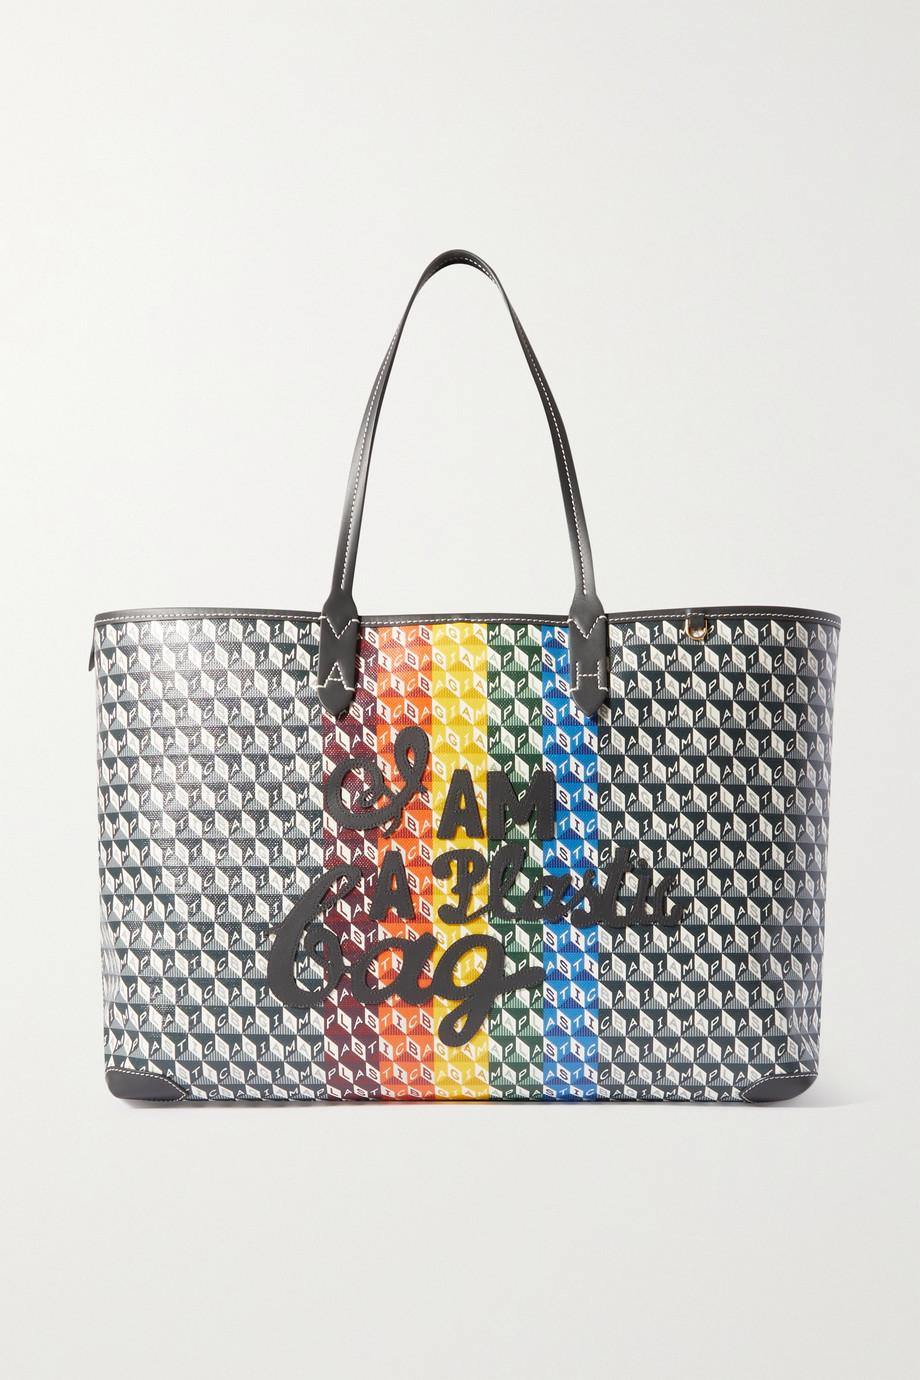 Anya Hindmarch + NET SUSTAIN I Am A Plastic Bag große Tote aus bedrucktem beschichtetem Canvas mit Lederbesätzen